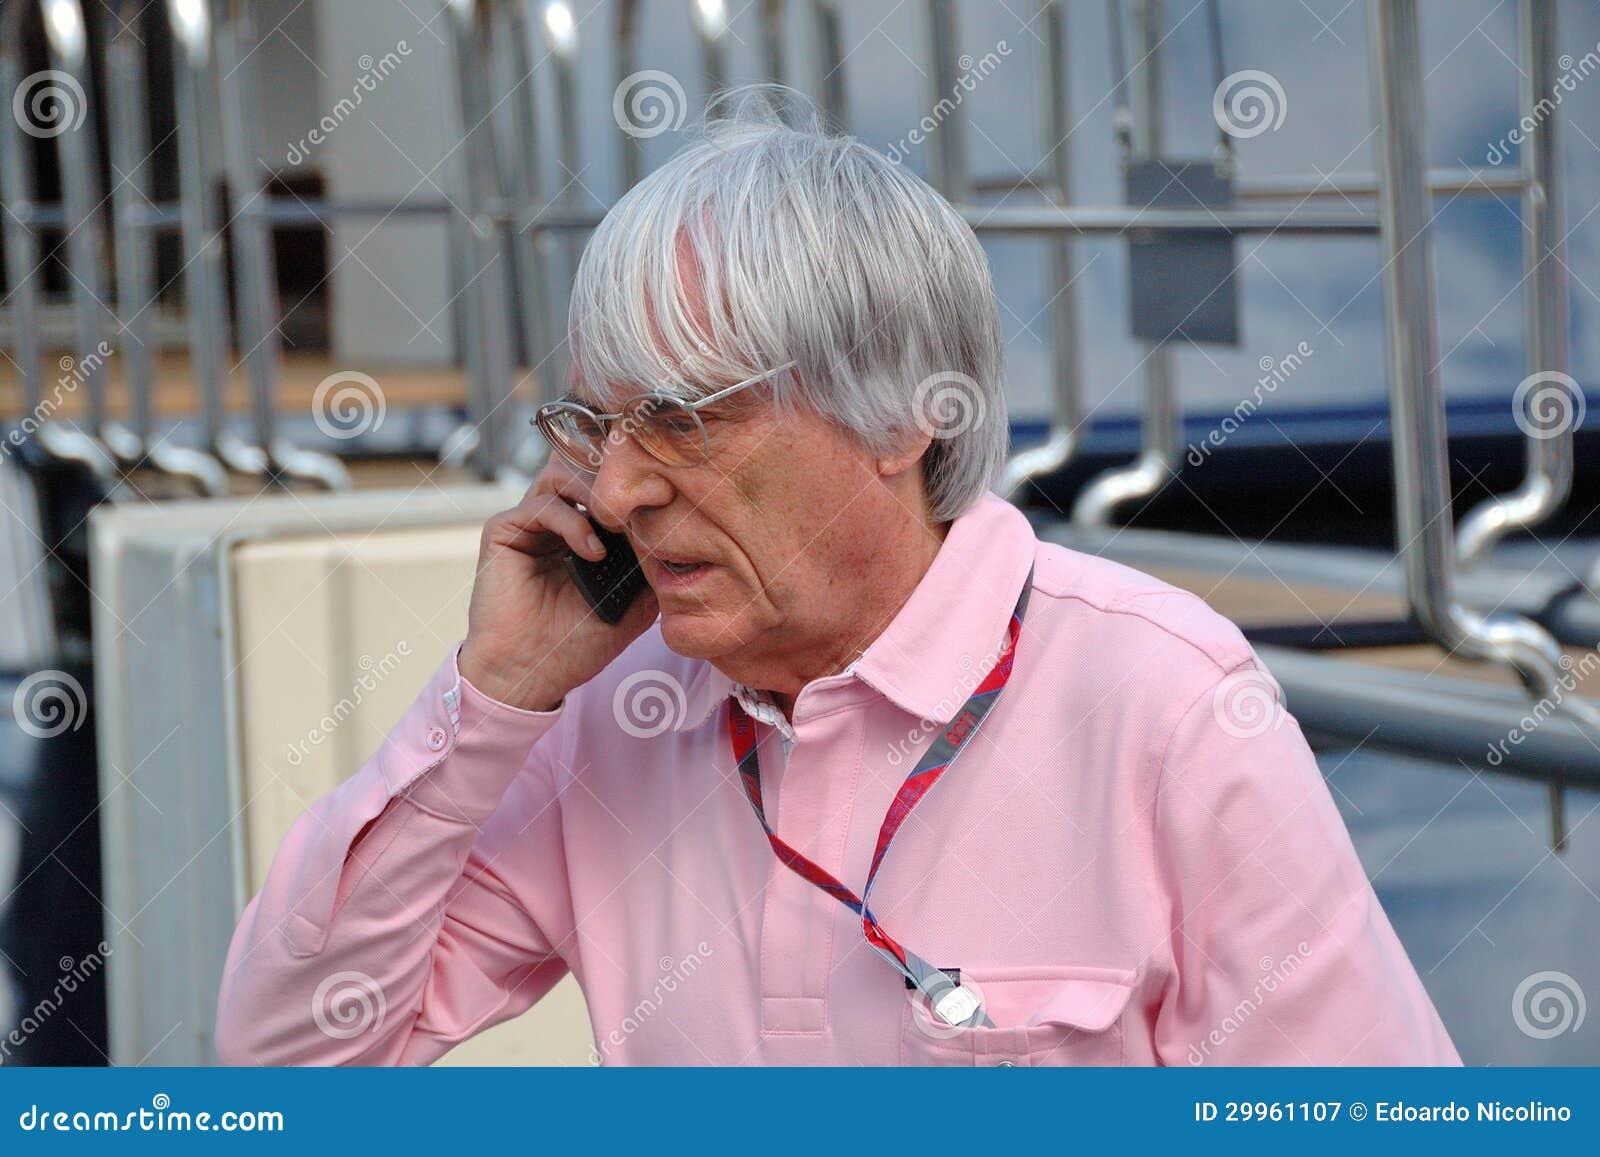 Bernie Ecclestone, босс управления Формула-1